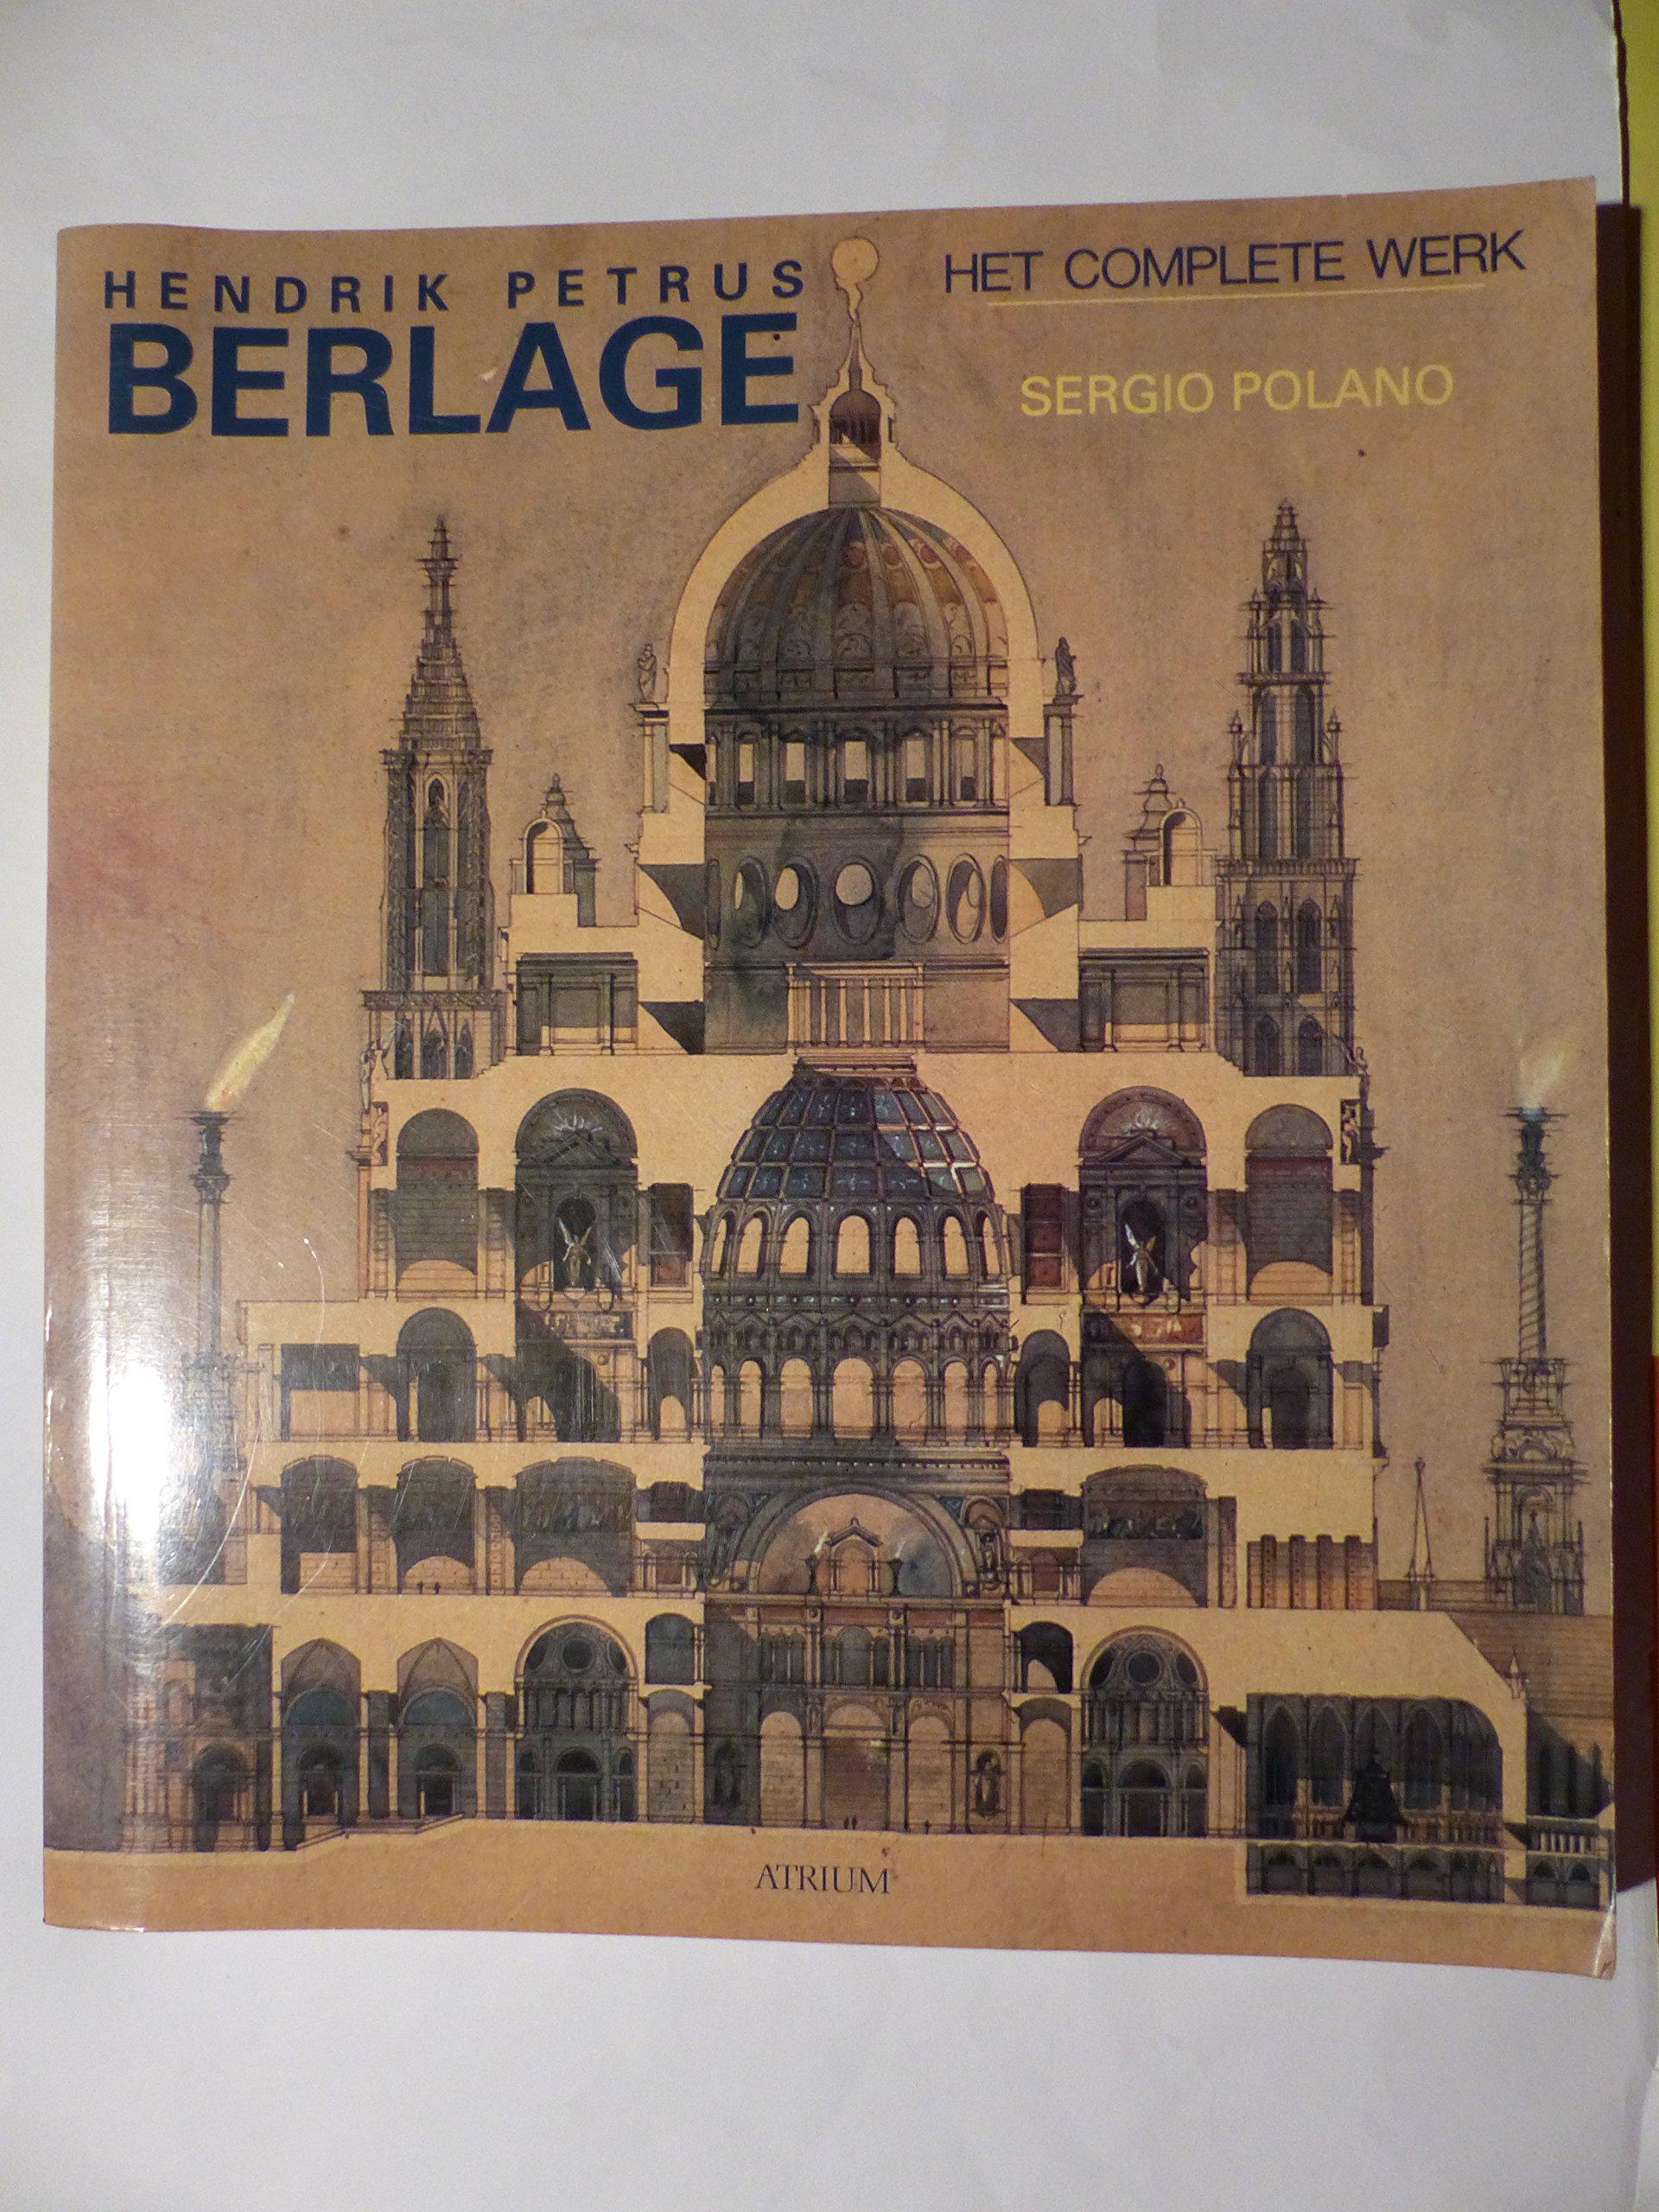 Hendrik Petrus Berlage Het Complete Werk 9789061133247